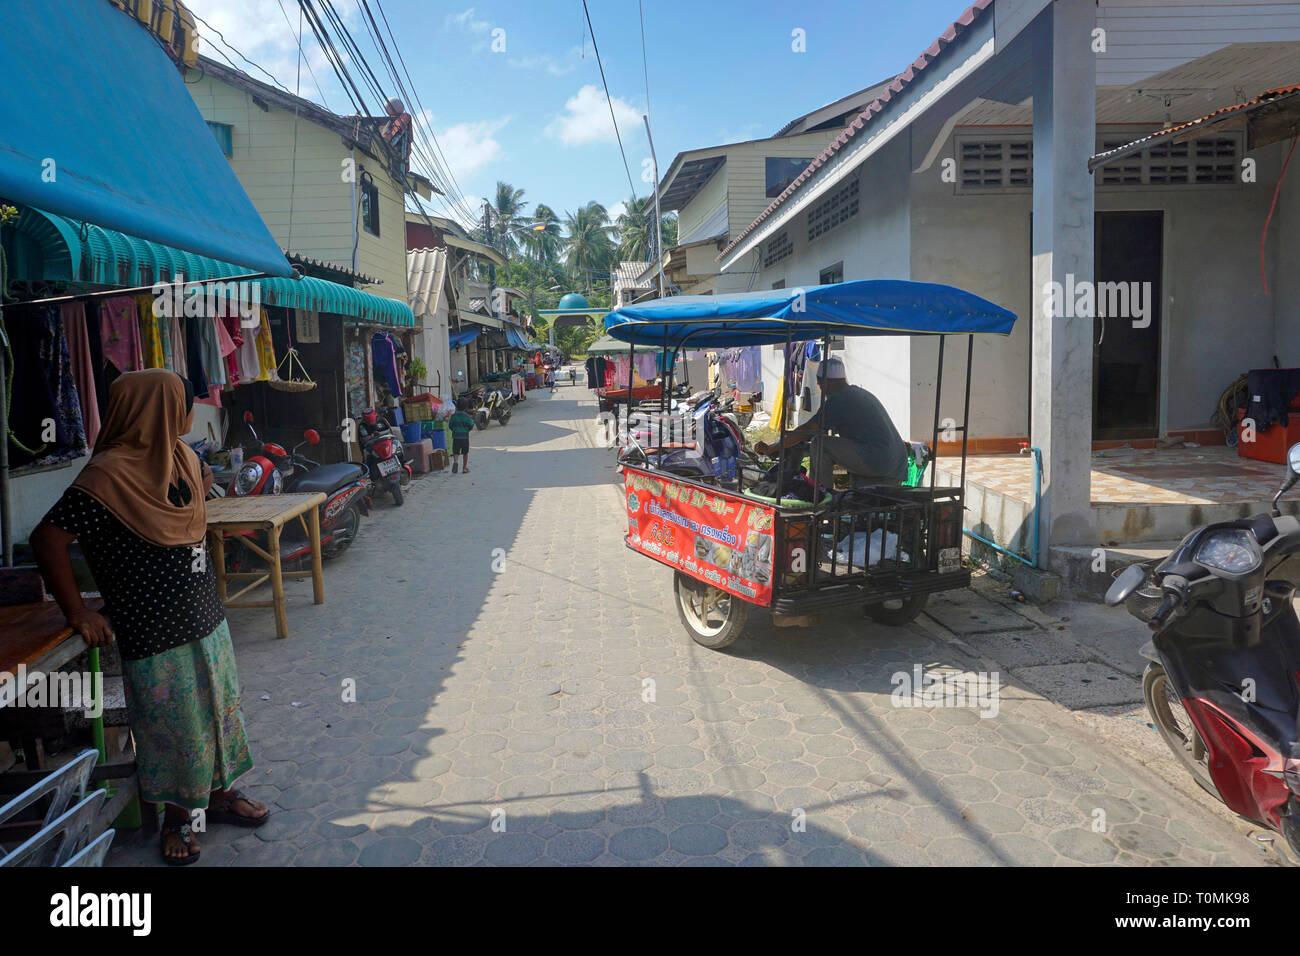 People on a street at fishing village Hua Thanon, Koh Samui, Gulf of Thailand, Thailand - Stock Image